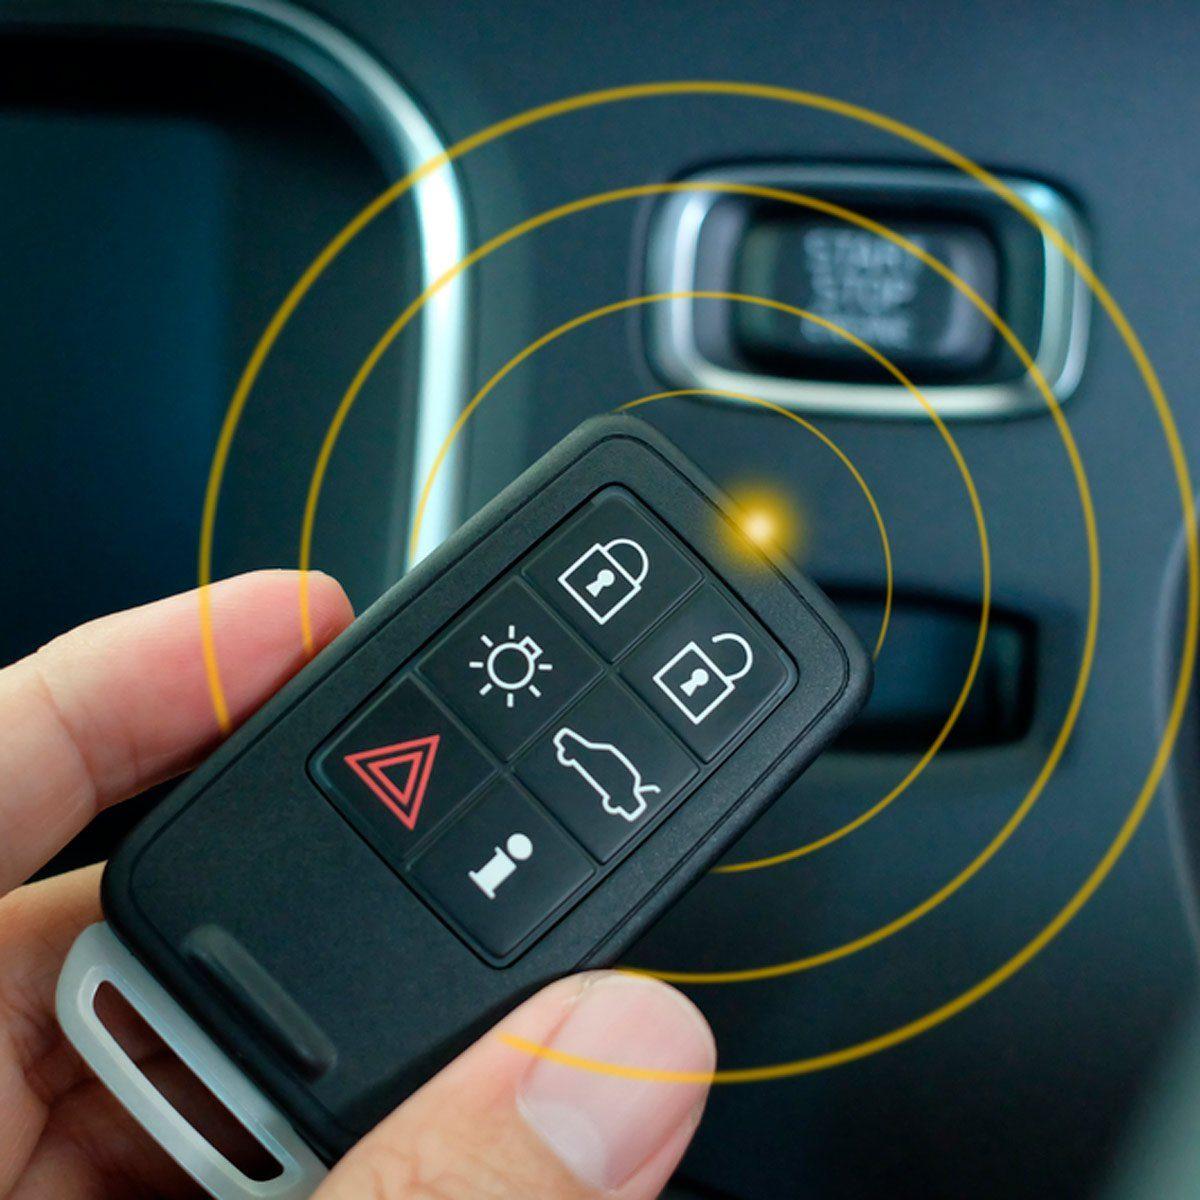 keyless entry car lock